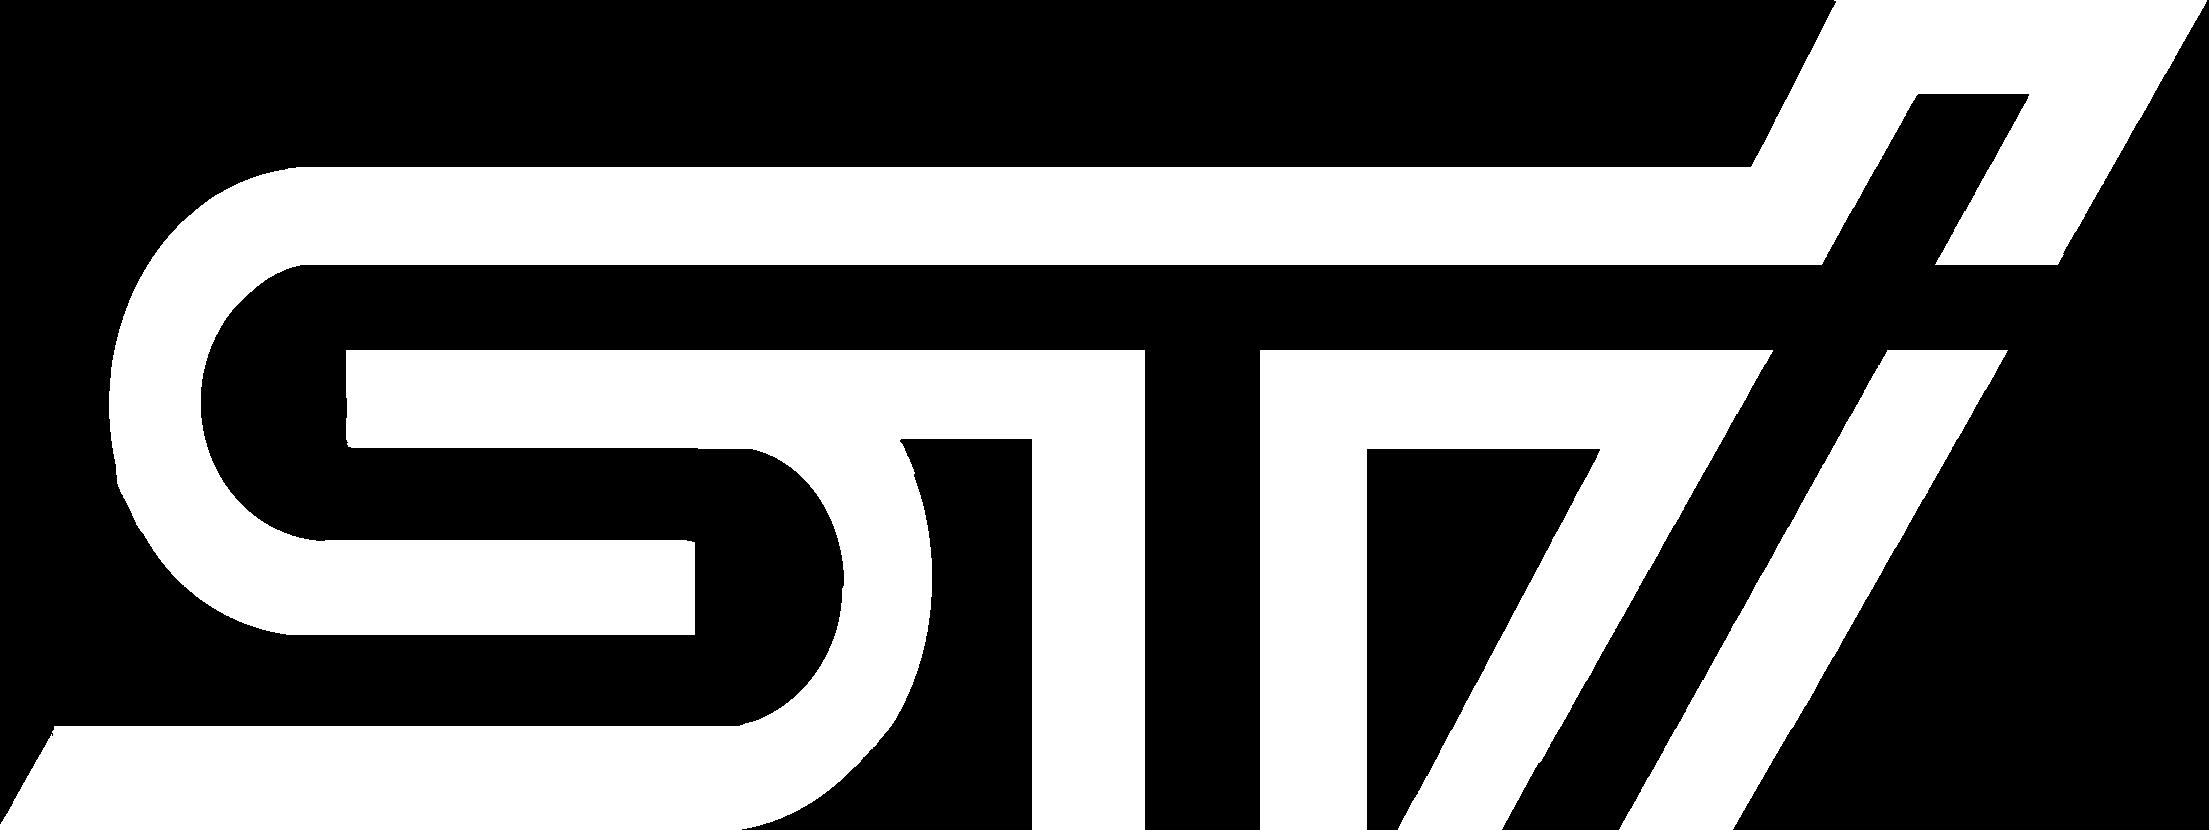 Sti Logo Wallpaper Wallpapersafari